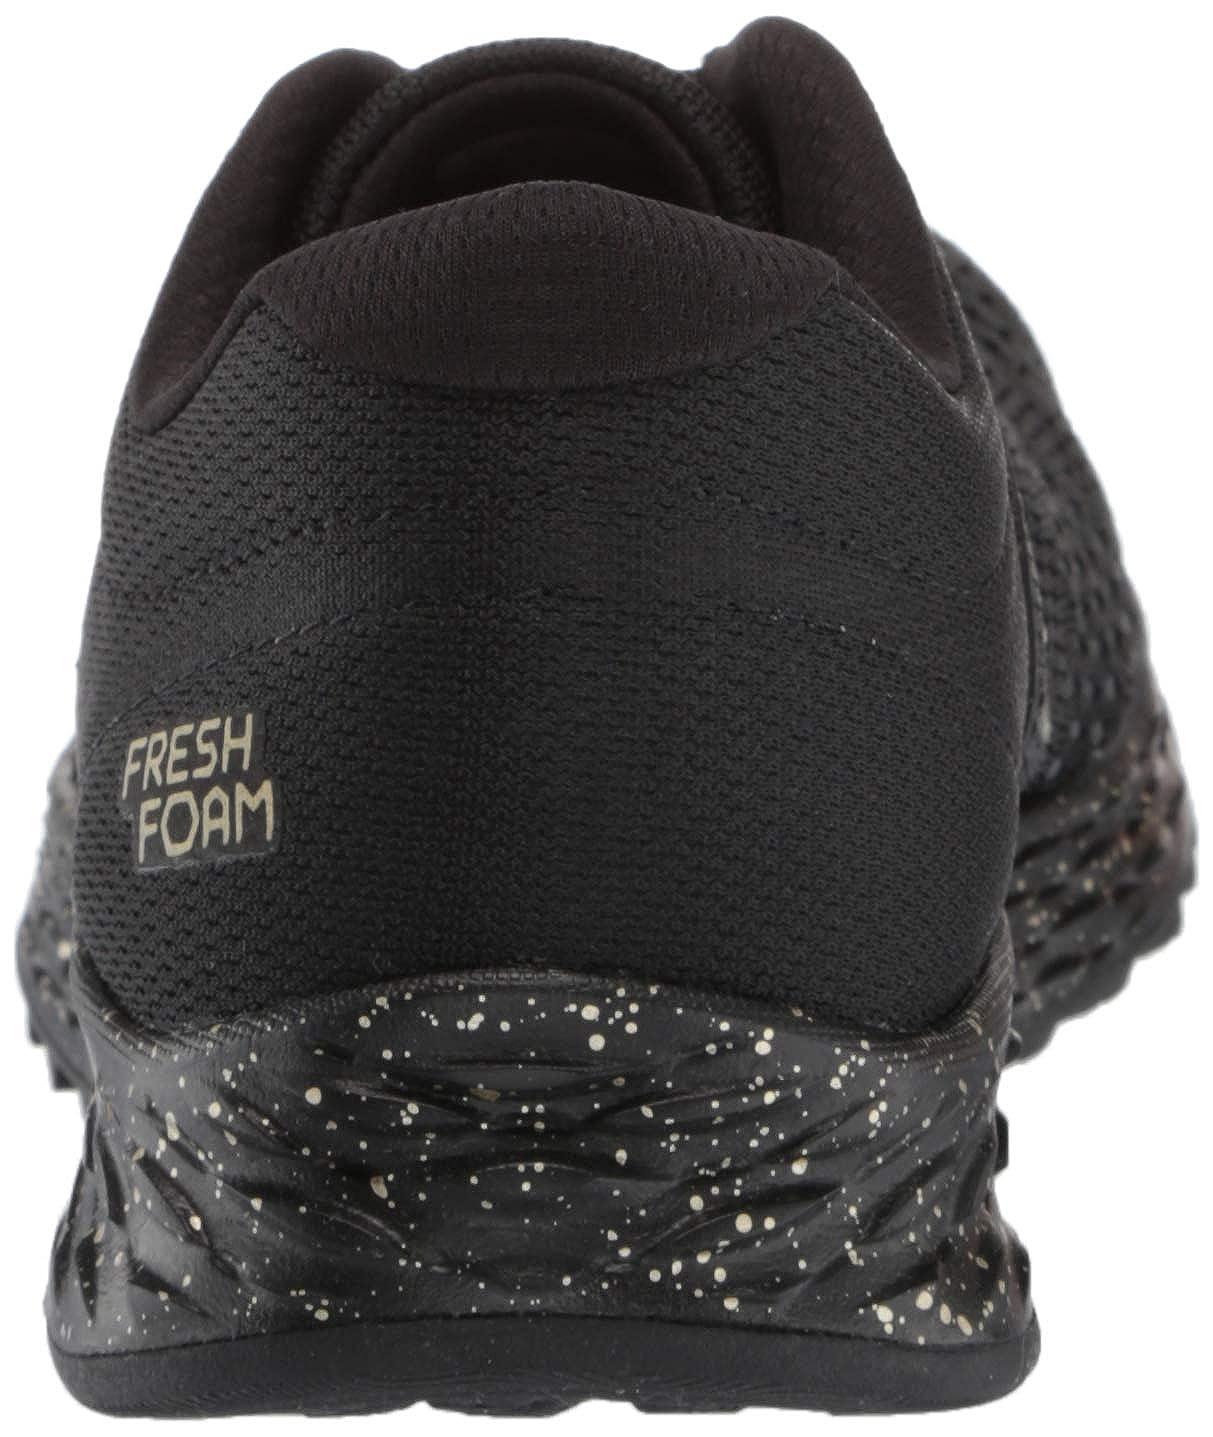 New Balance Damen Fresh Foam Arishi Arishi Arishi Laufschuhe  98a92c